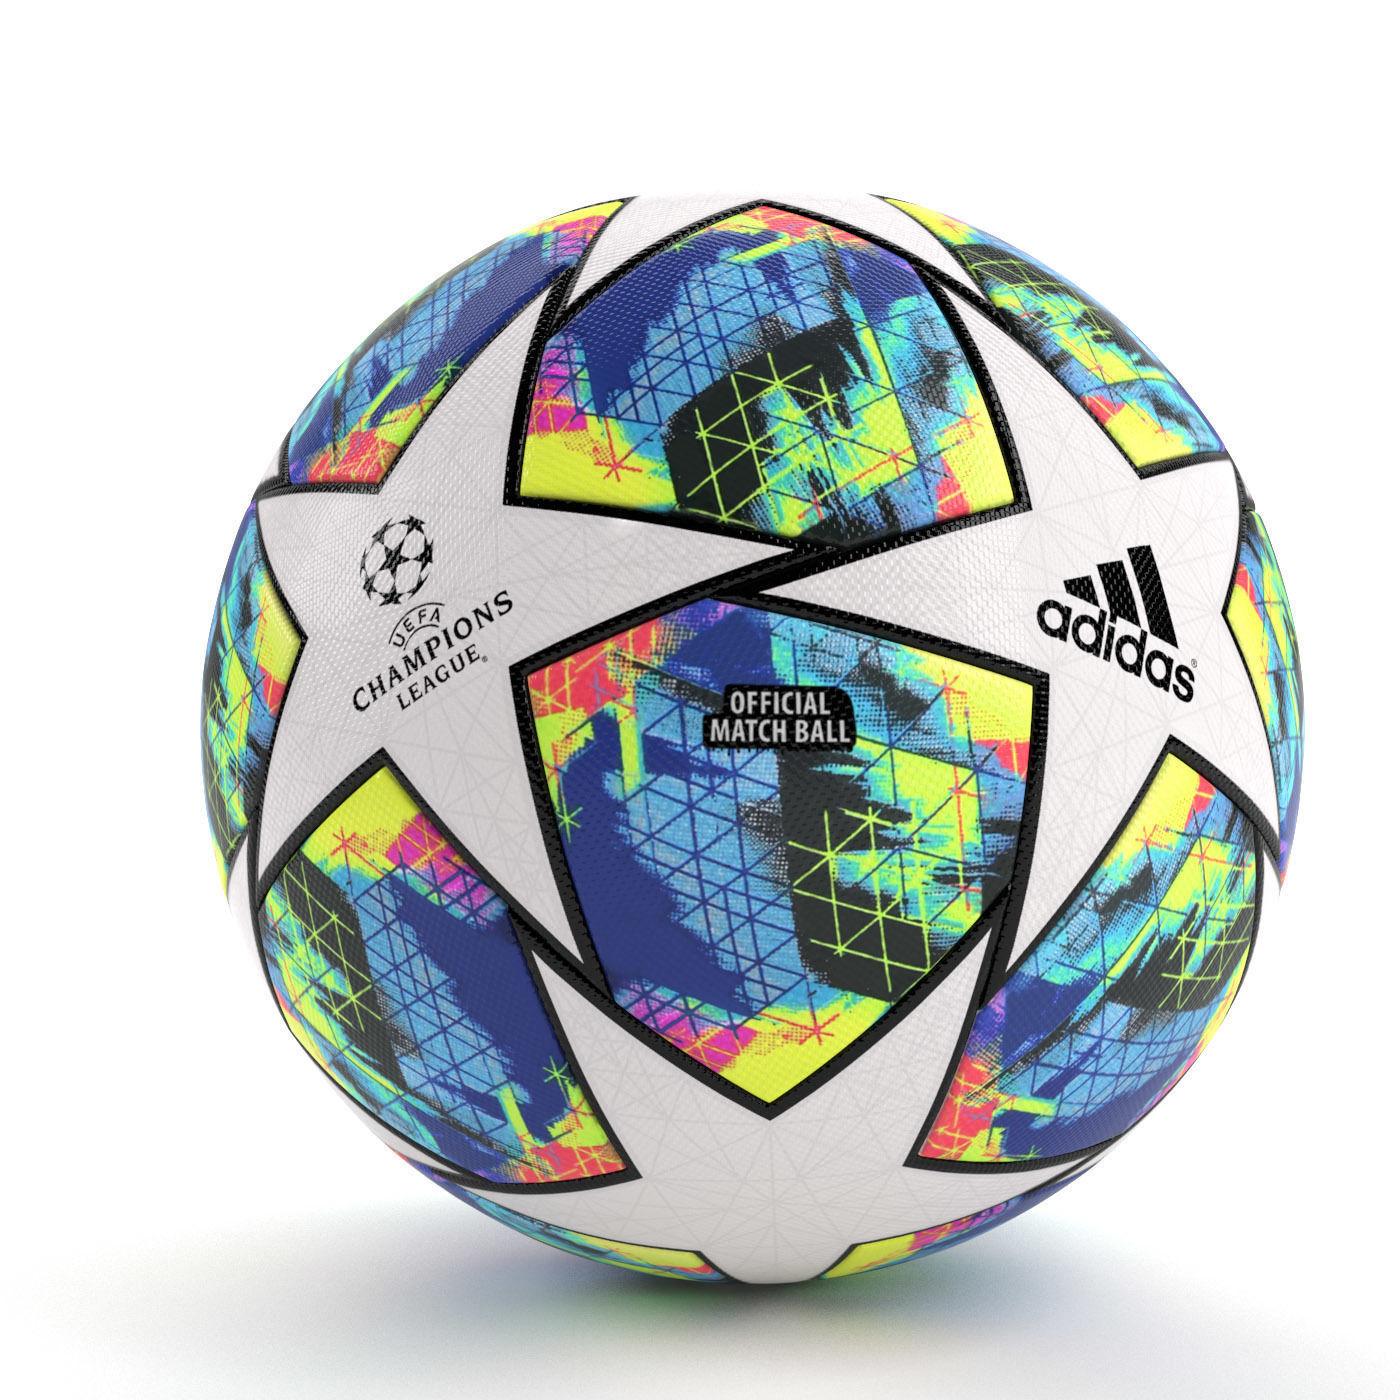 UEFA CHAMPIONS LEAGUE FINALE 19 Ball PBR